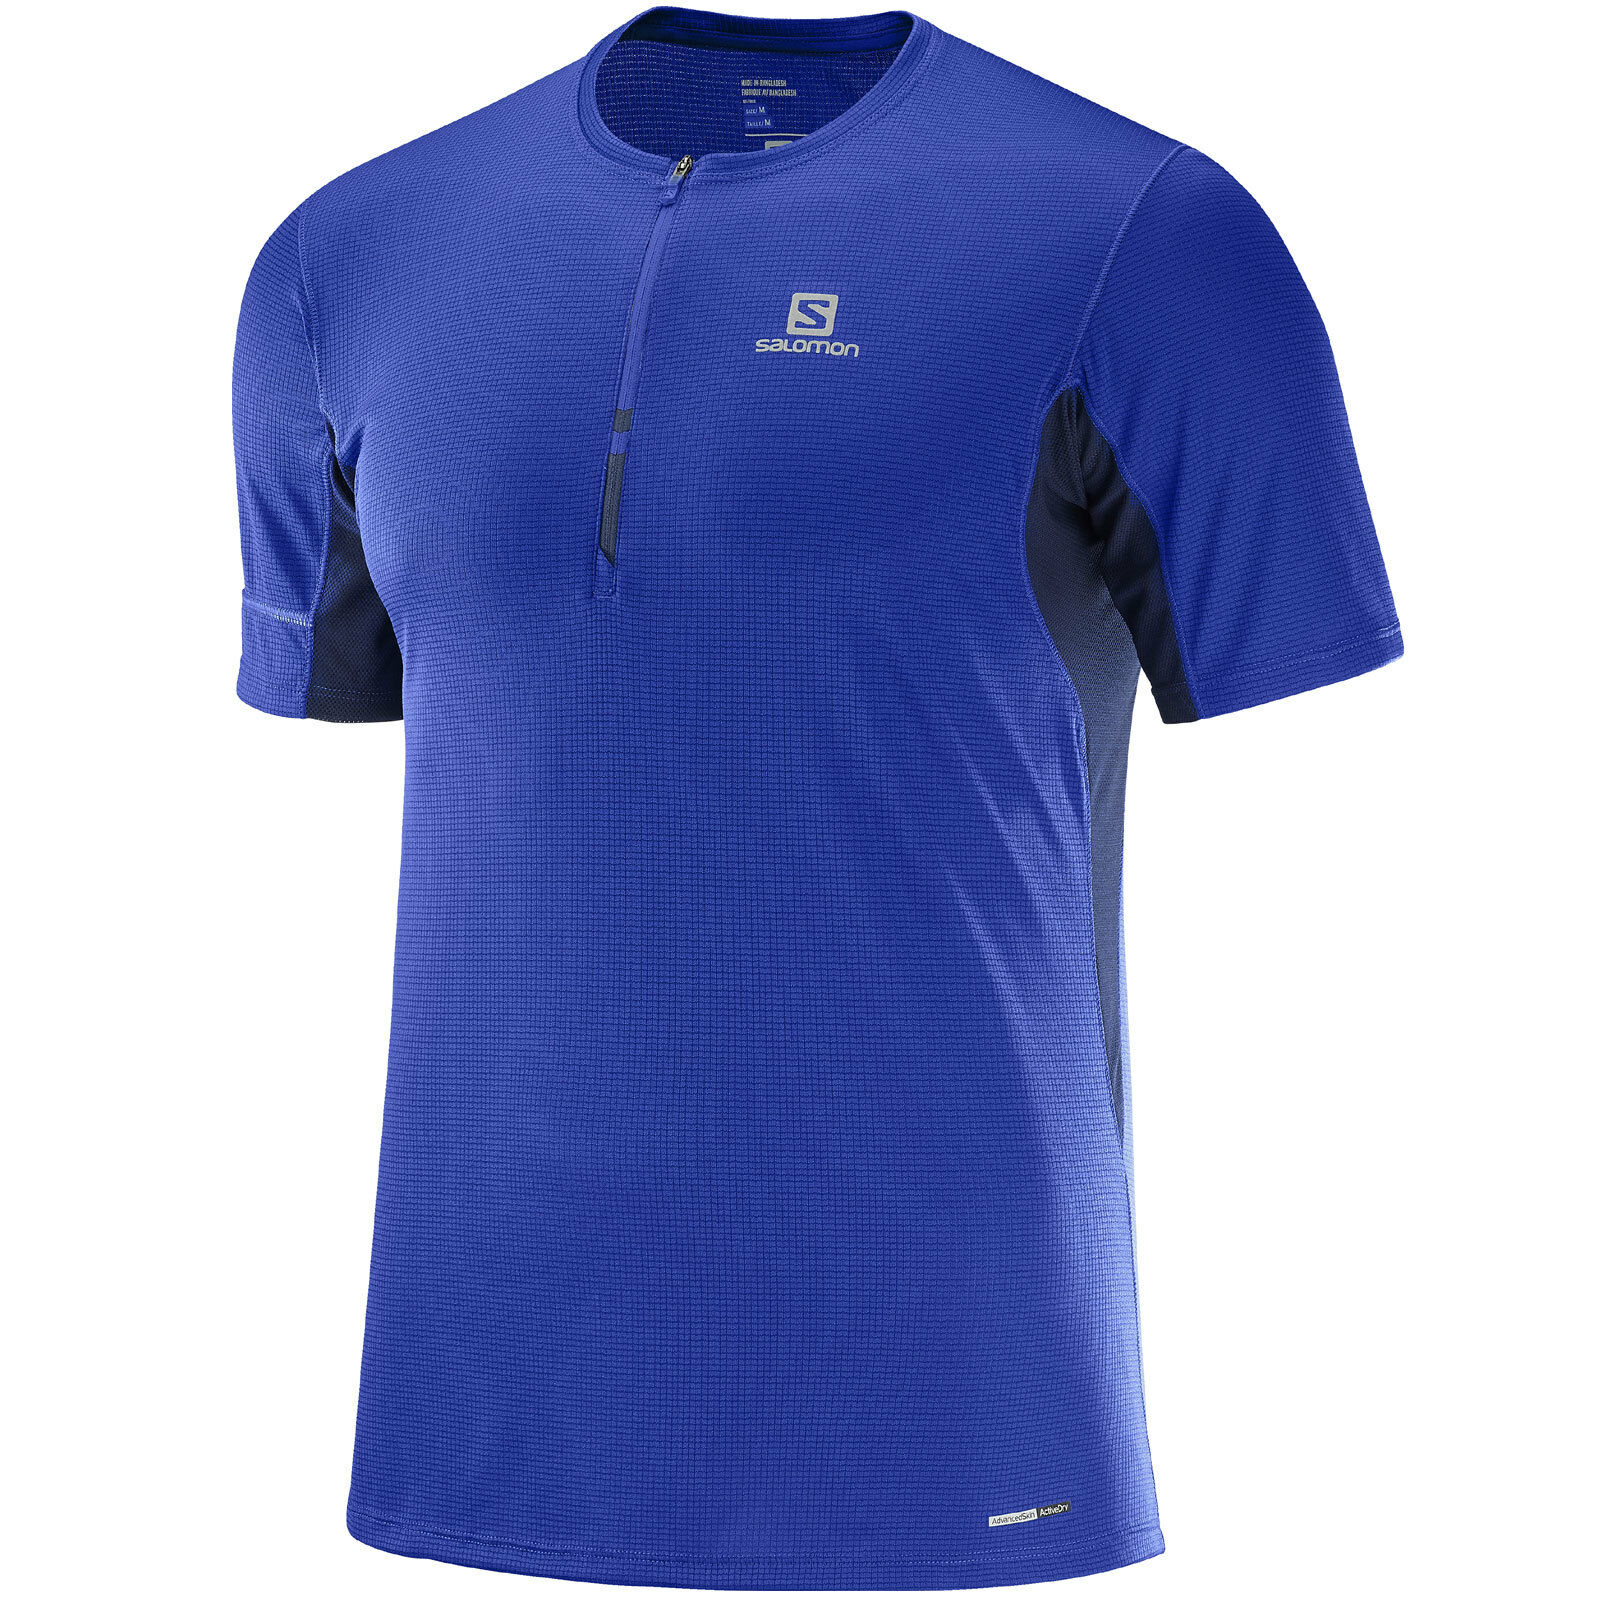 Salomon Agile short Sleeve T Shirt Men's Running Shirt Sports Functional